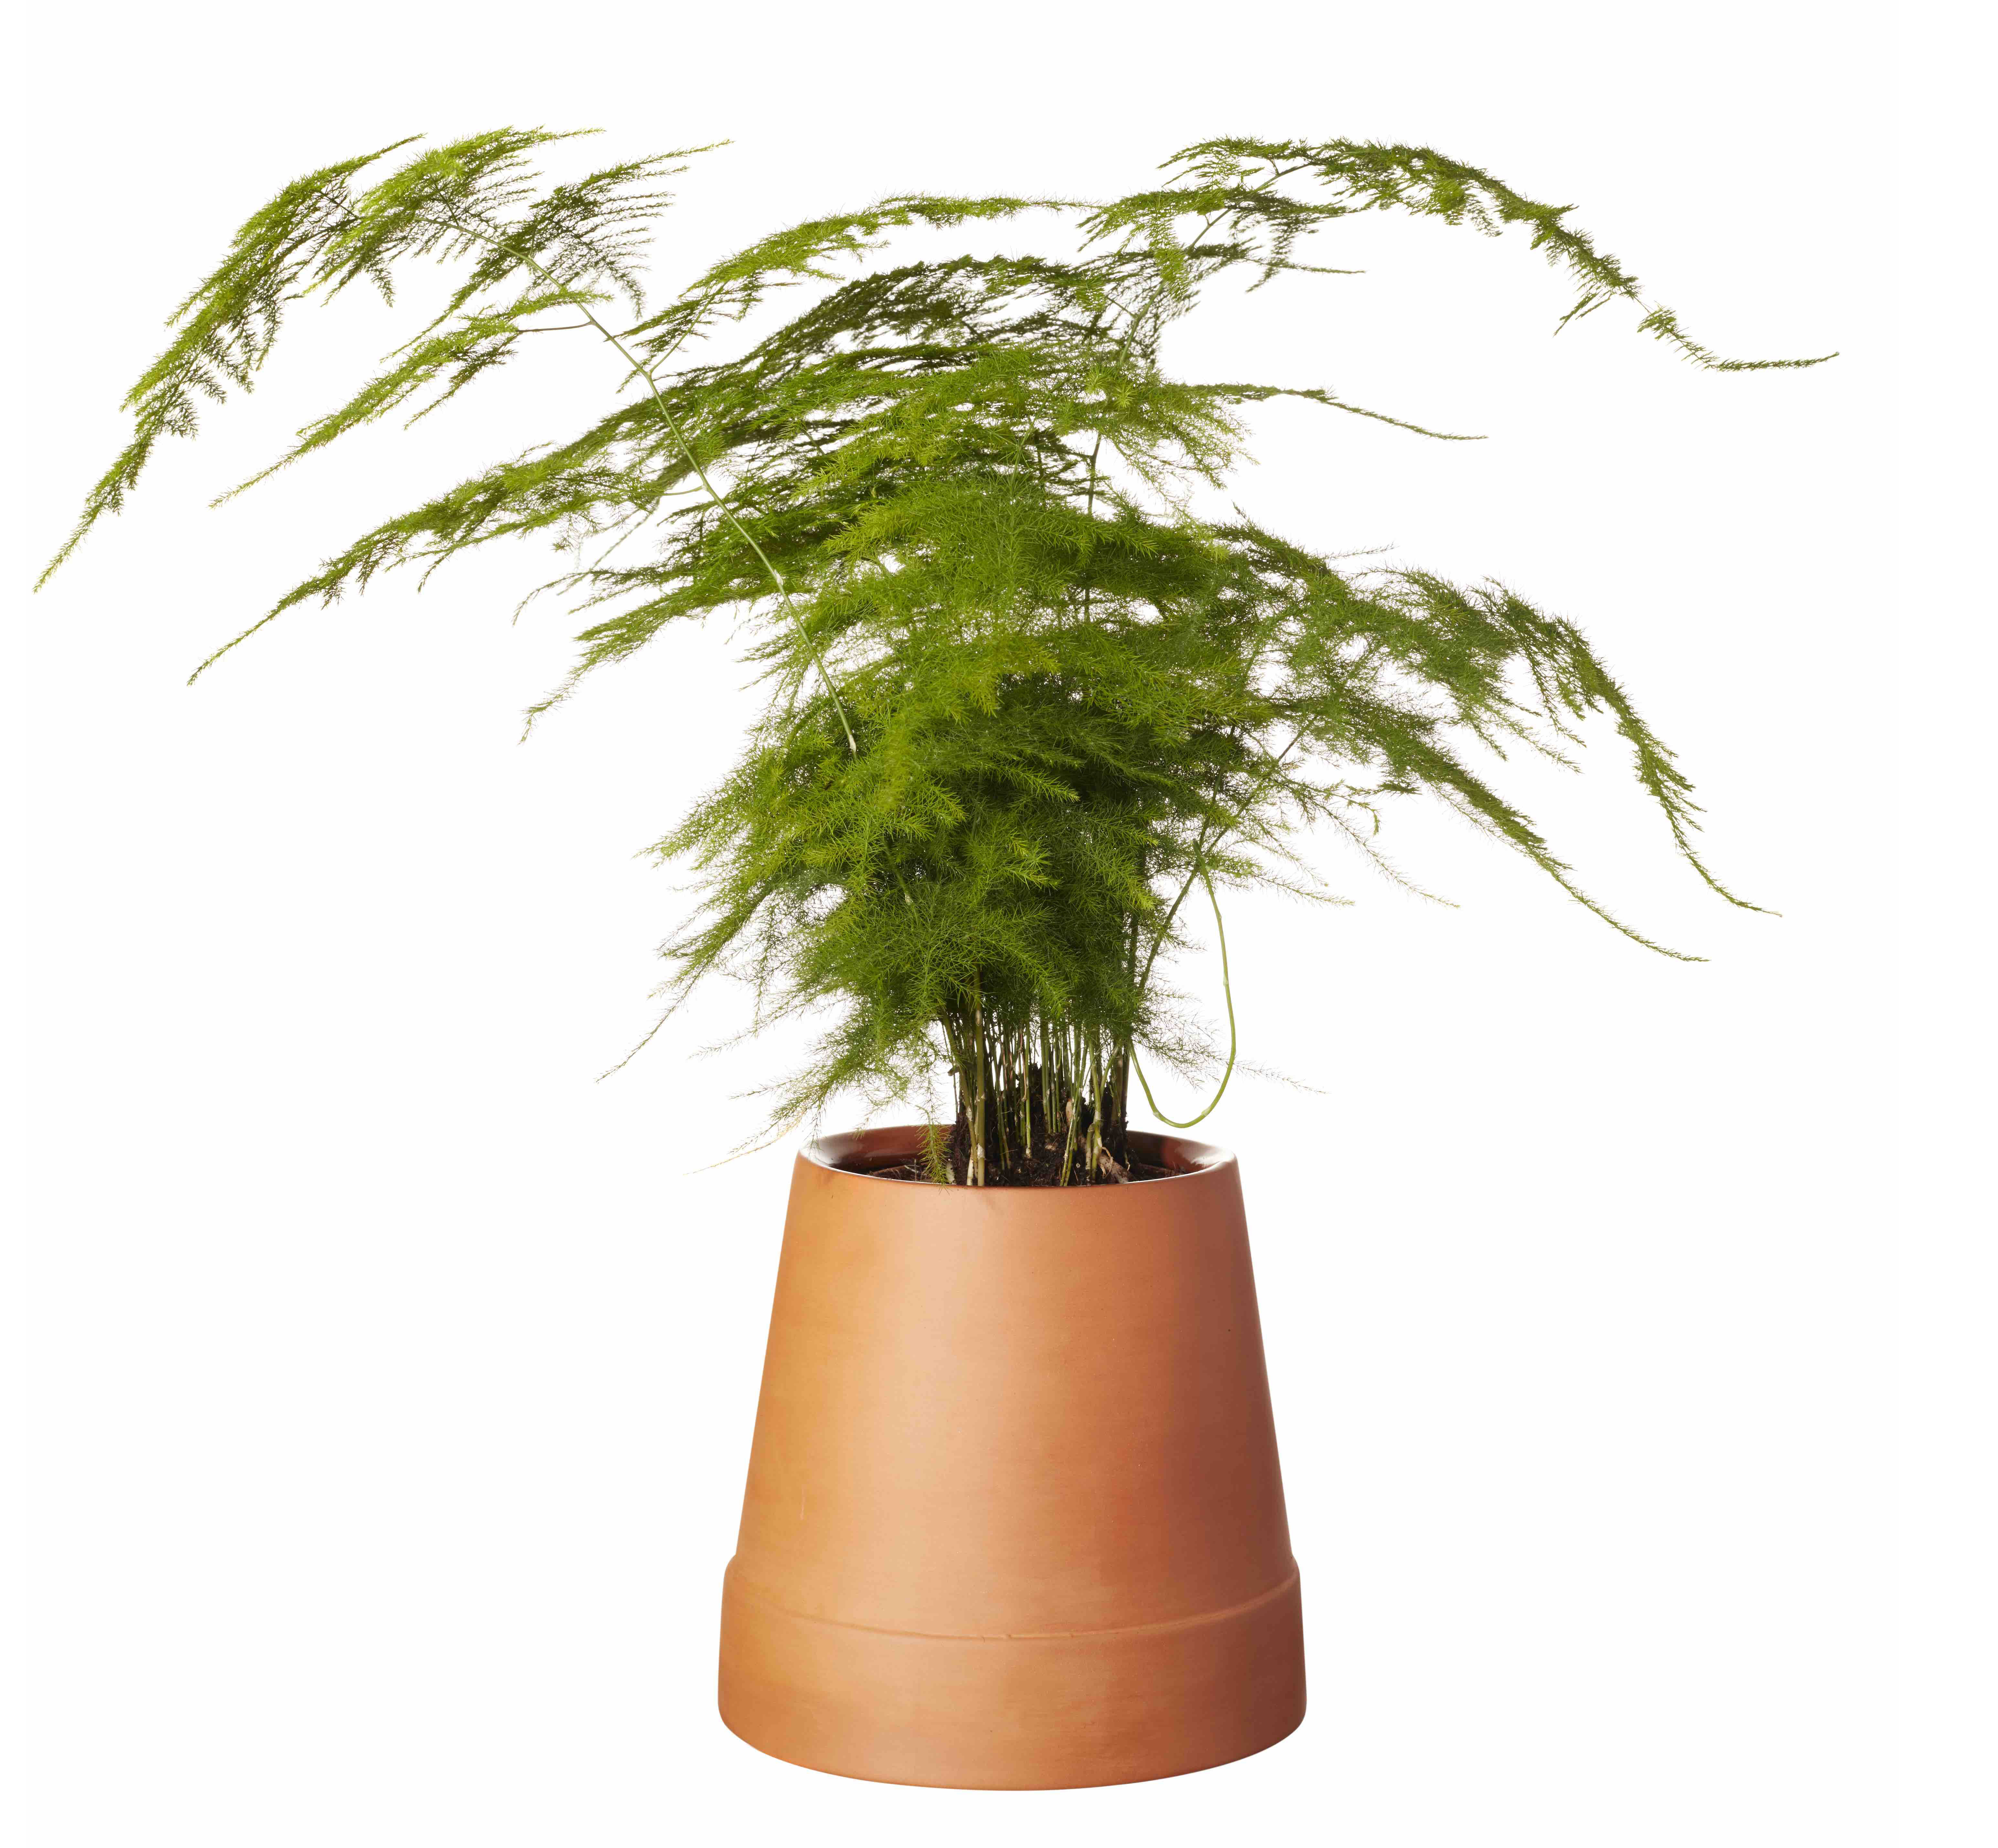 Outdoor - Töpfe und Pflanzen - Flipped Blumentopf mit Wasserreservoir / Terrakotta - Boskke - Terrakotta - Terrakotta